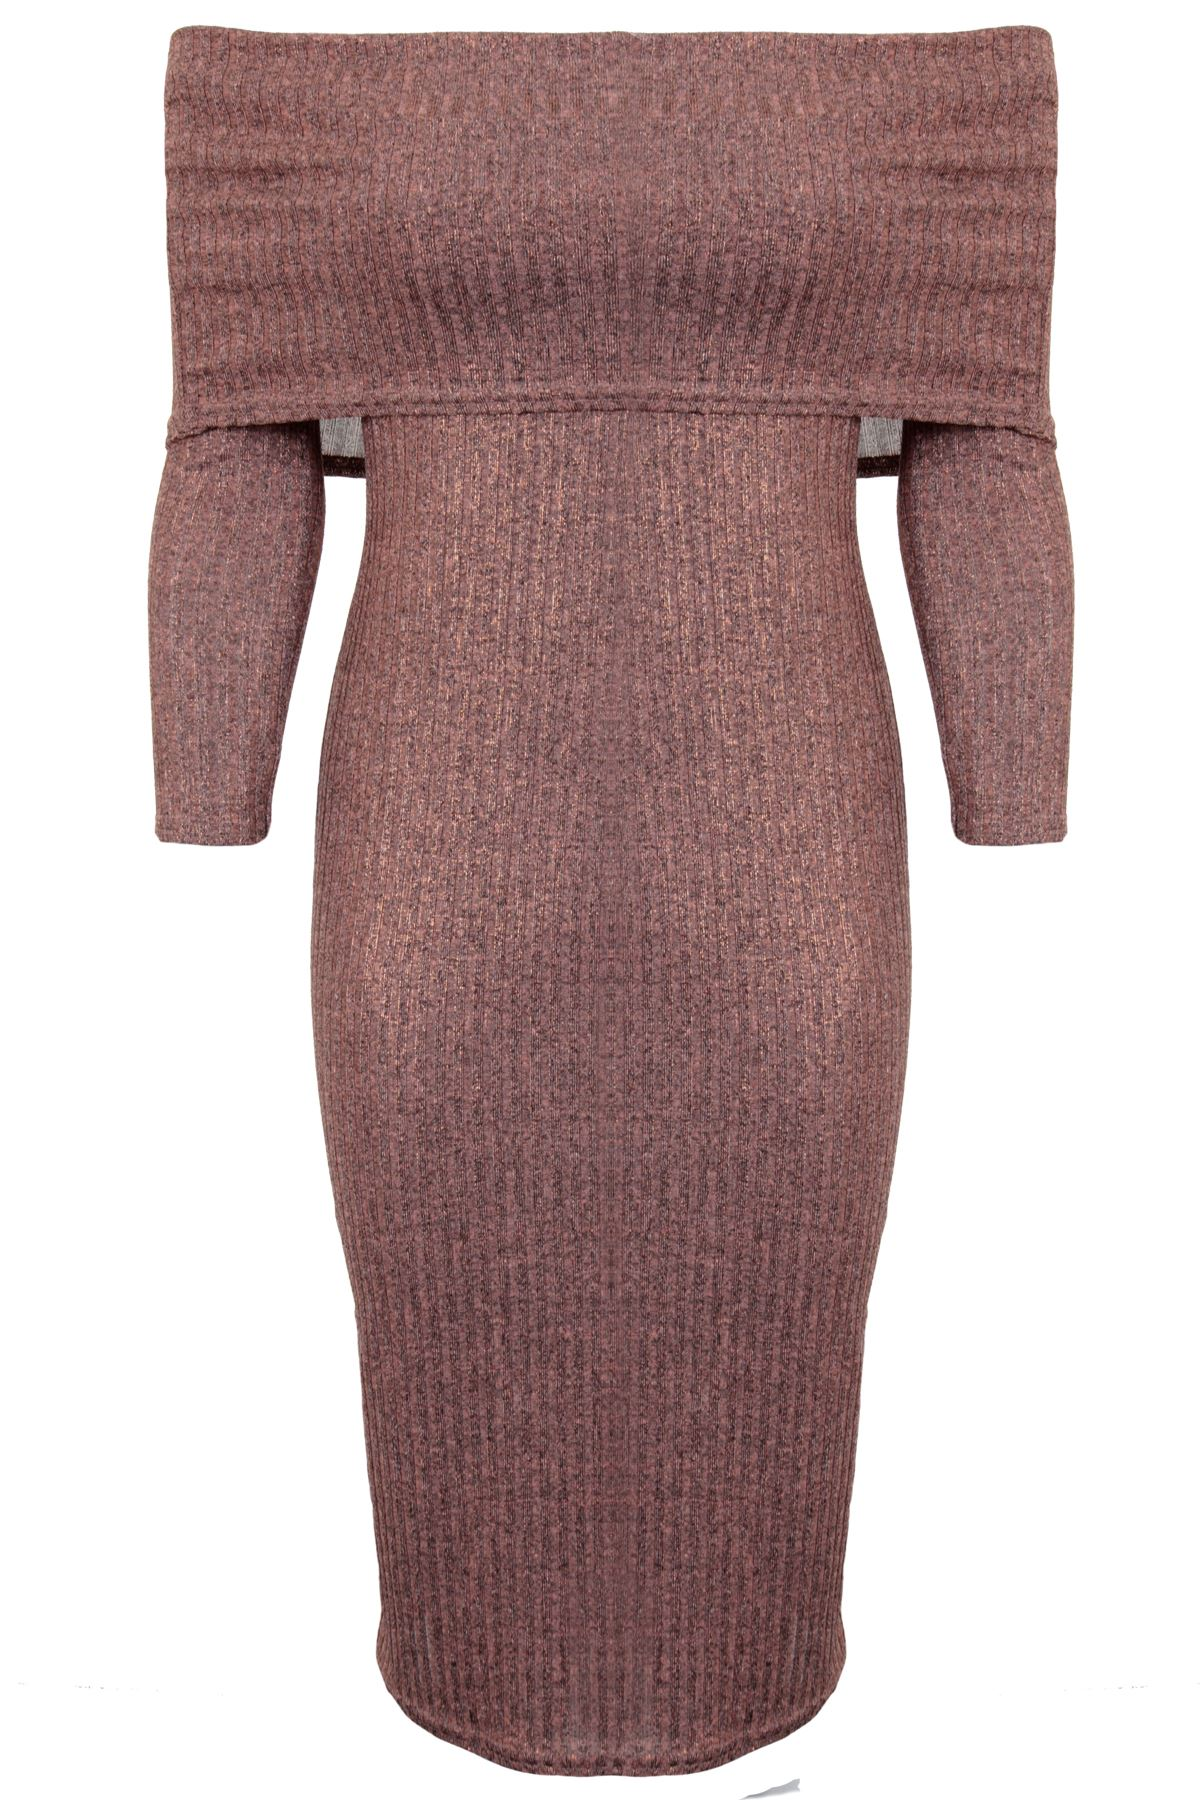 Opinion pink dress bodycon long knee length sleeve port douglas